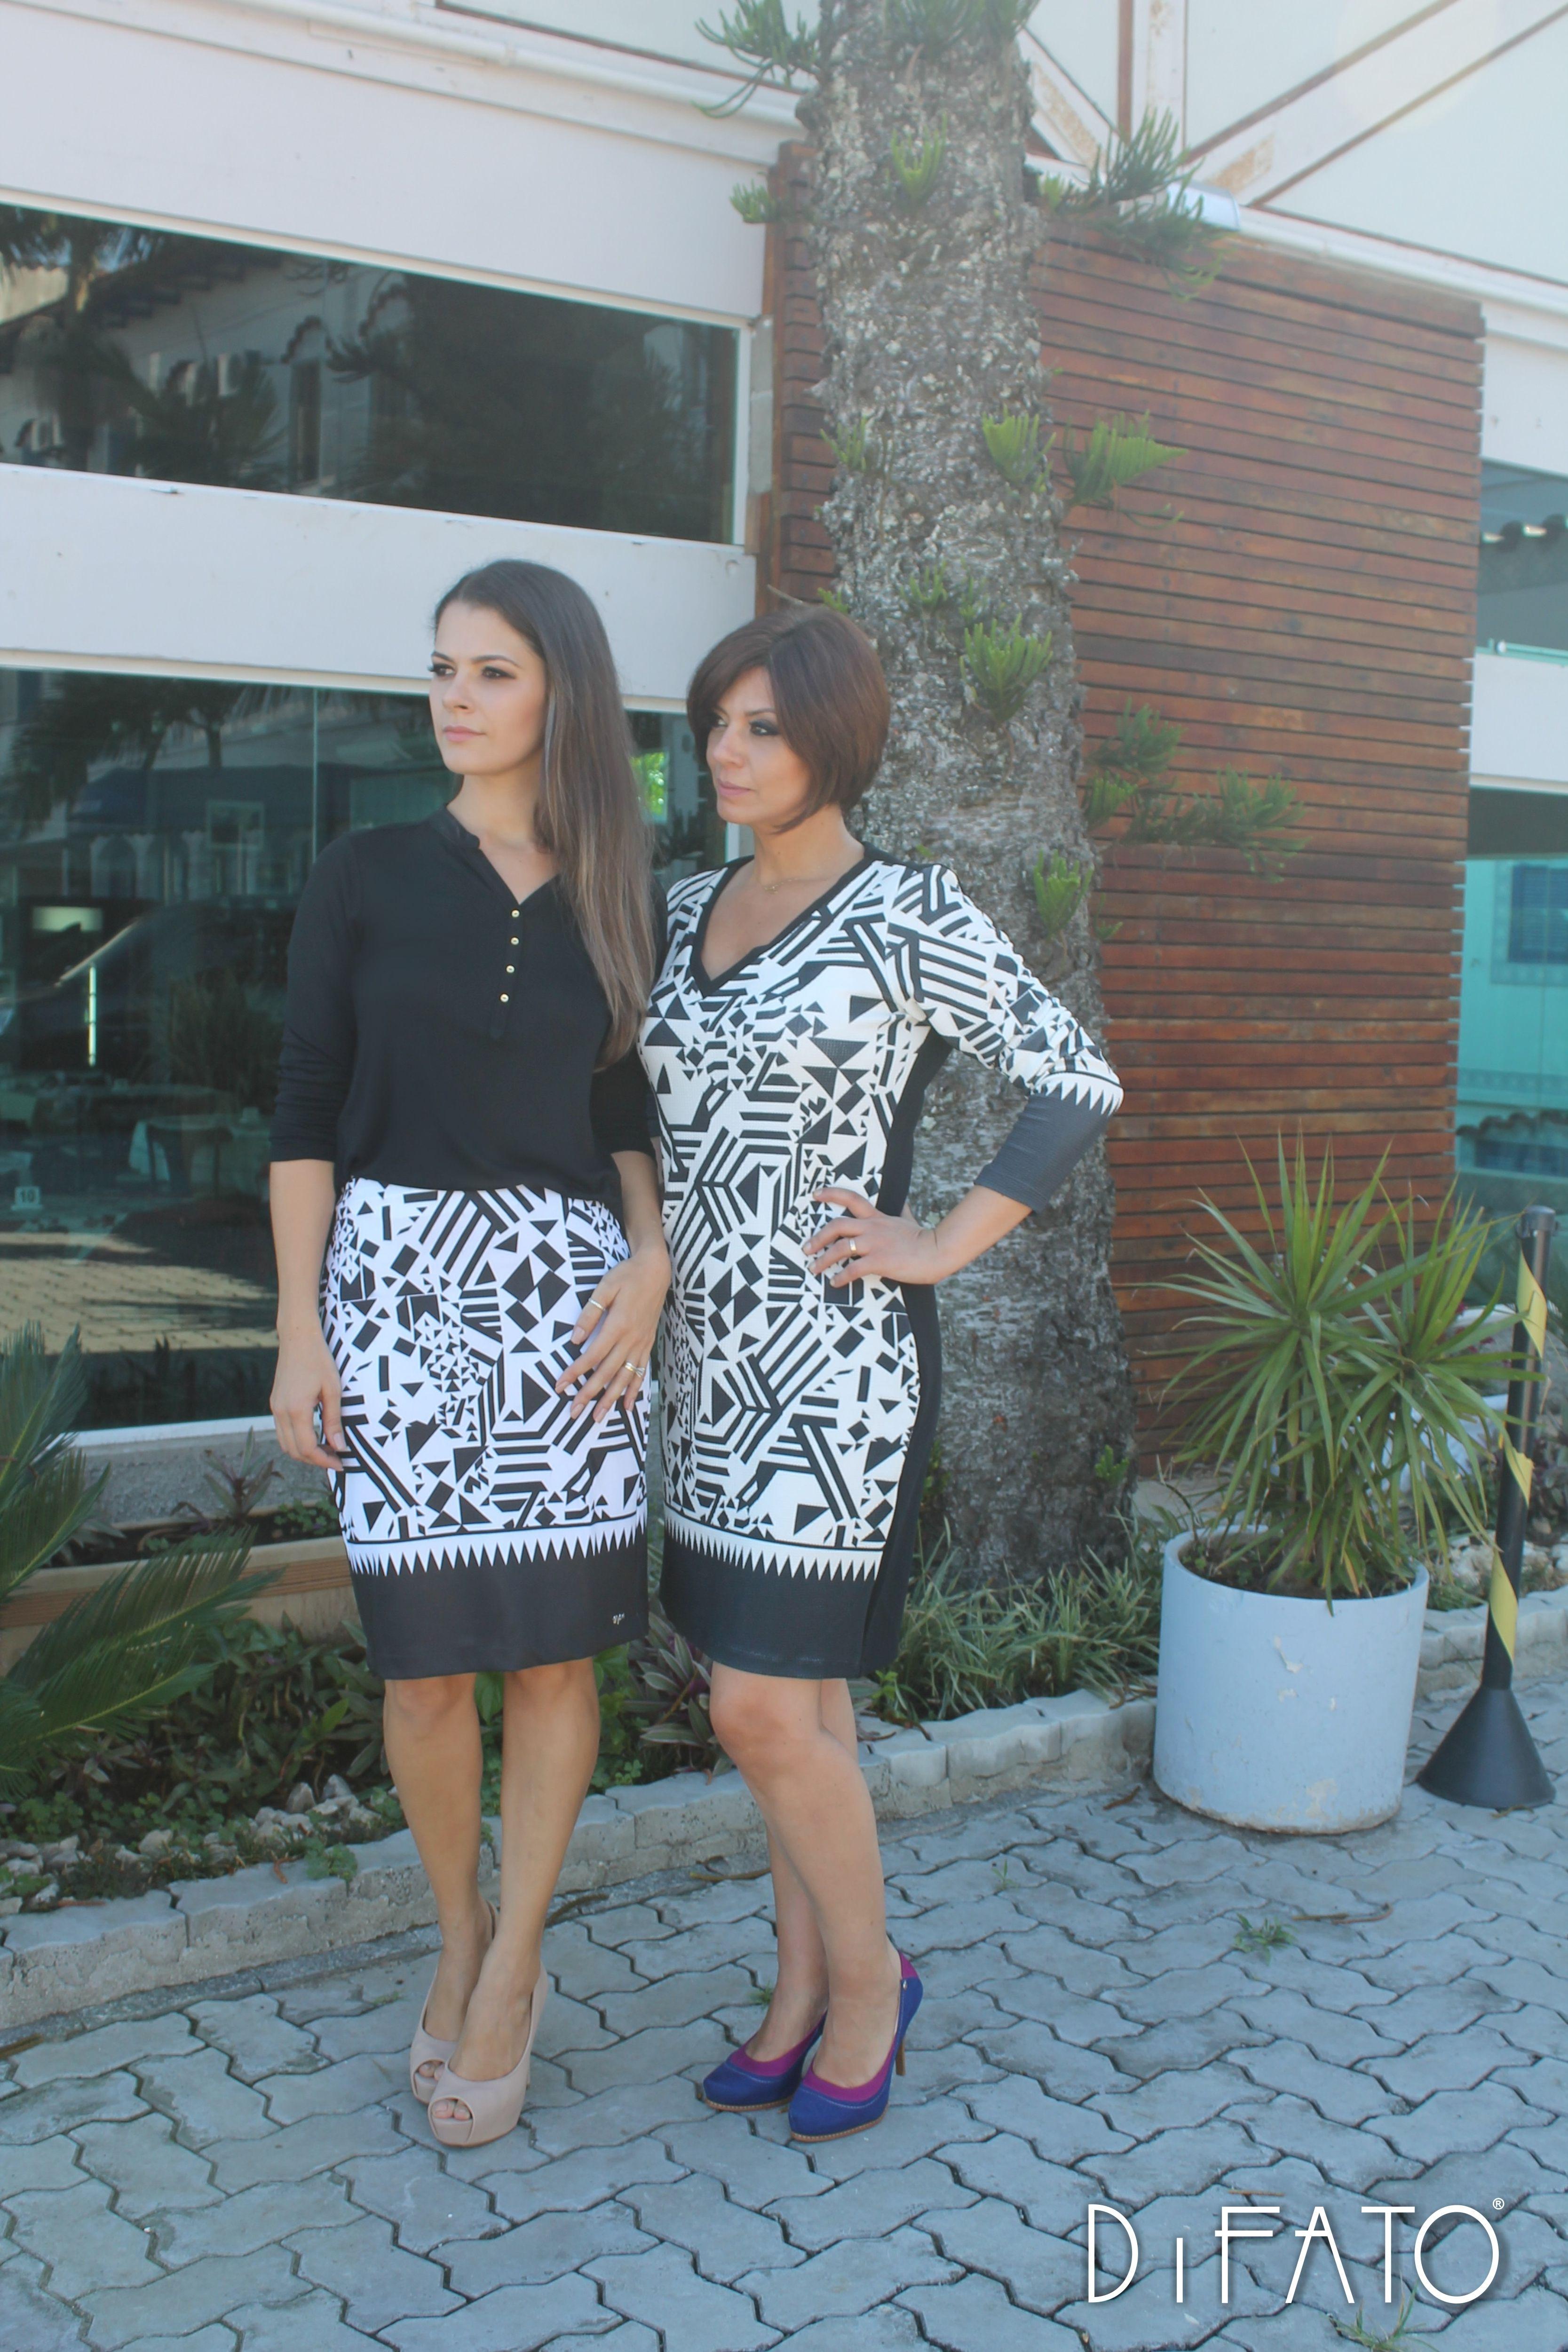 #moda #desfile #lançamento #mulherclássica #saia #vestido #preto #estampaexclusiva #photo #style #outonoinverno2016 #DiFATO #amodaéservocê